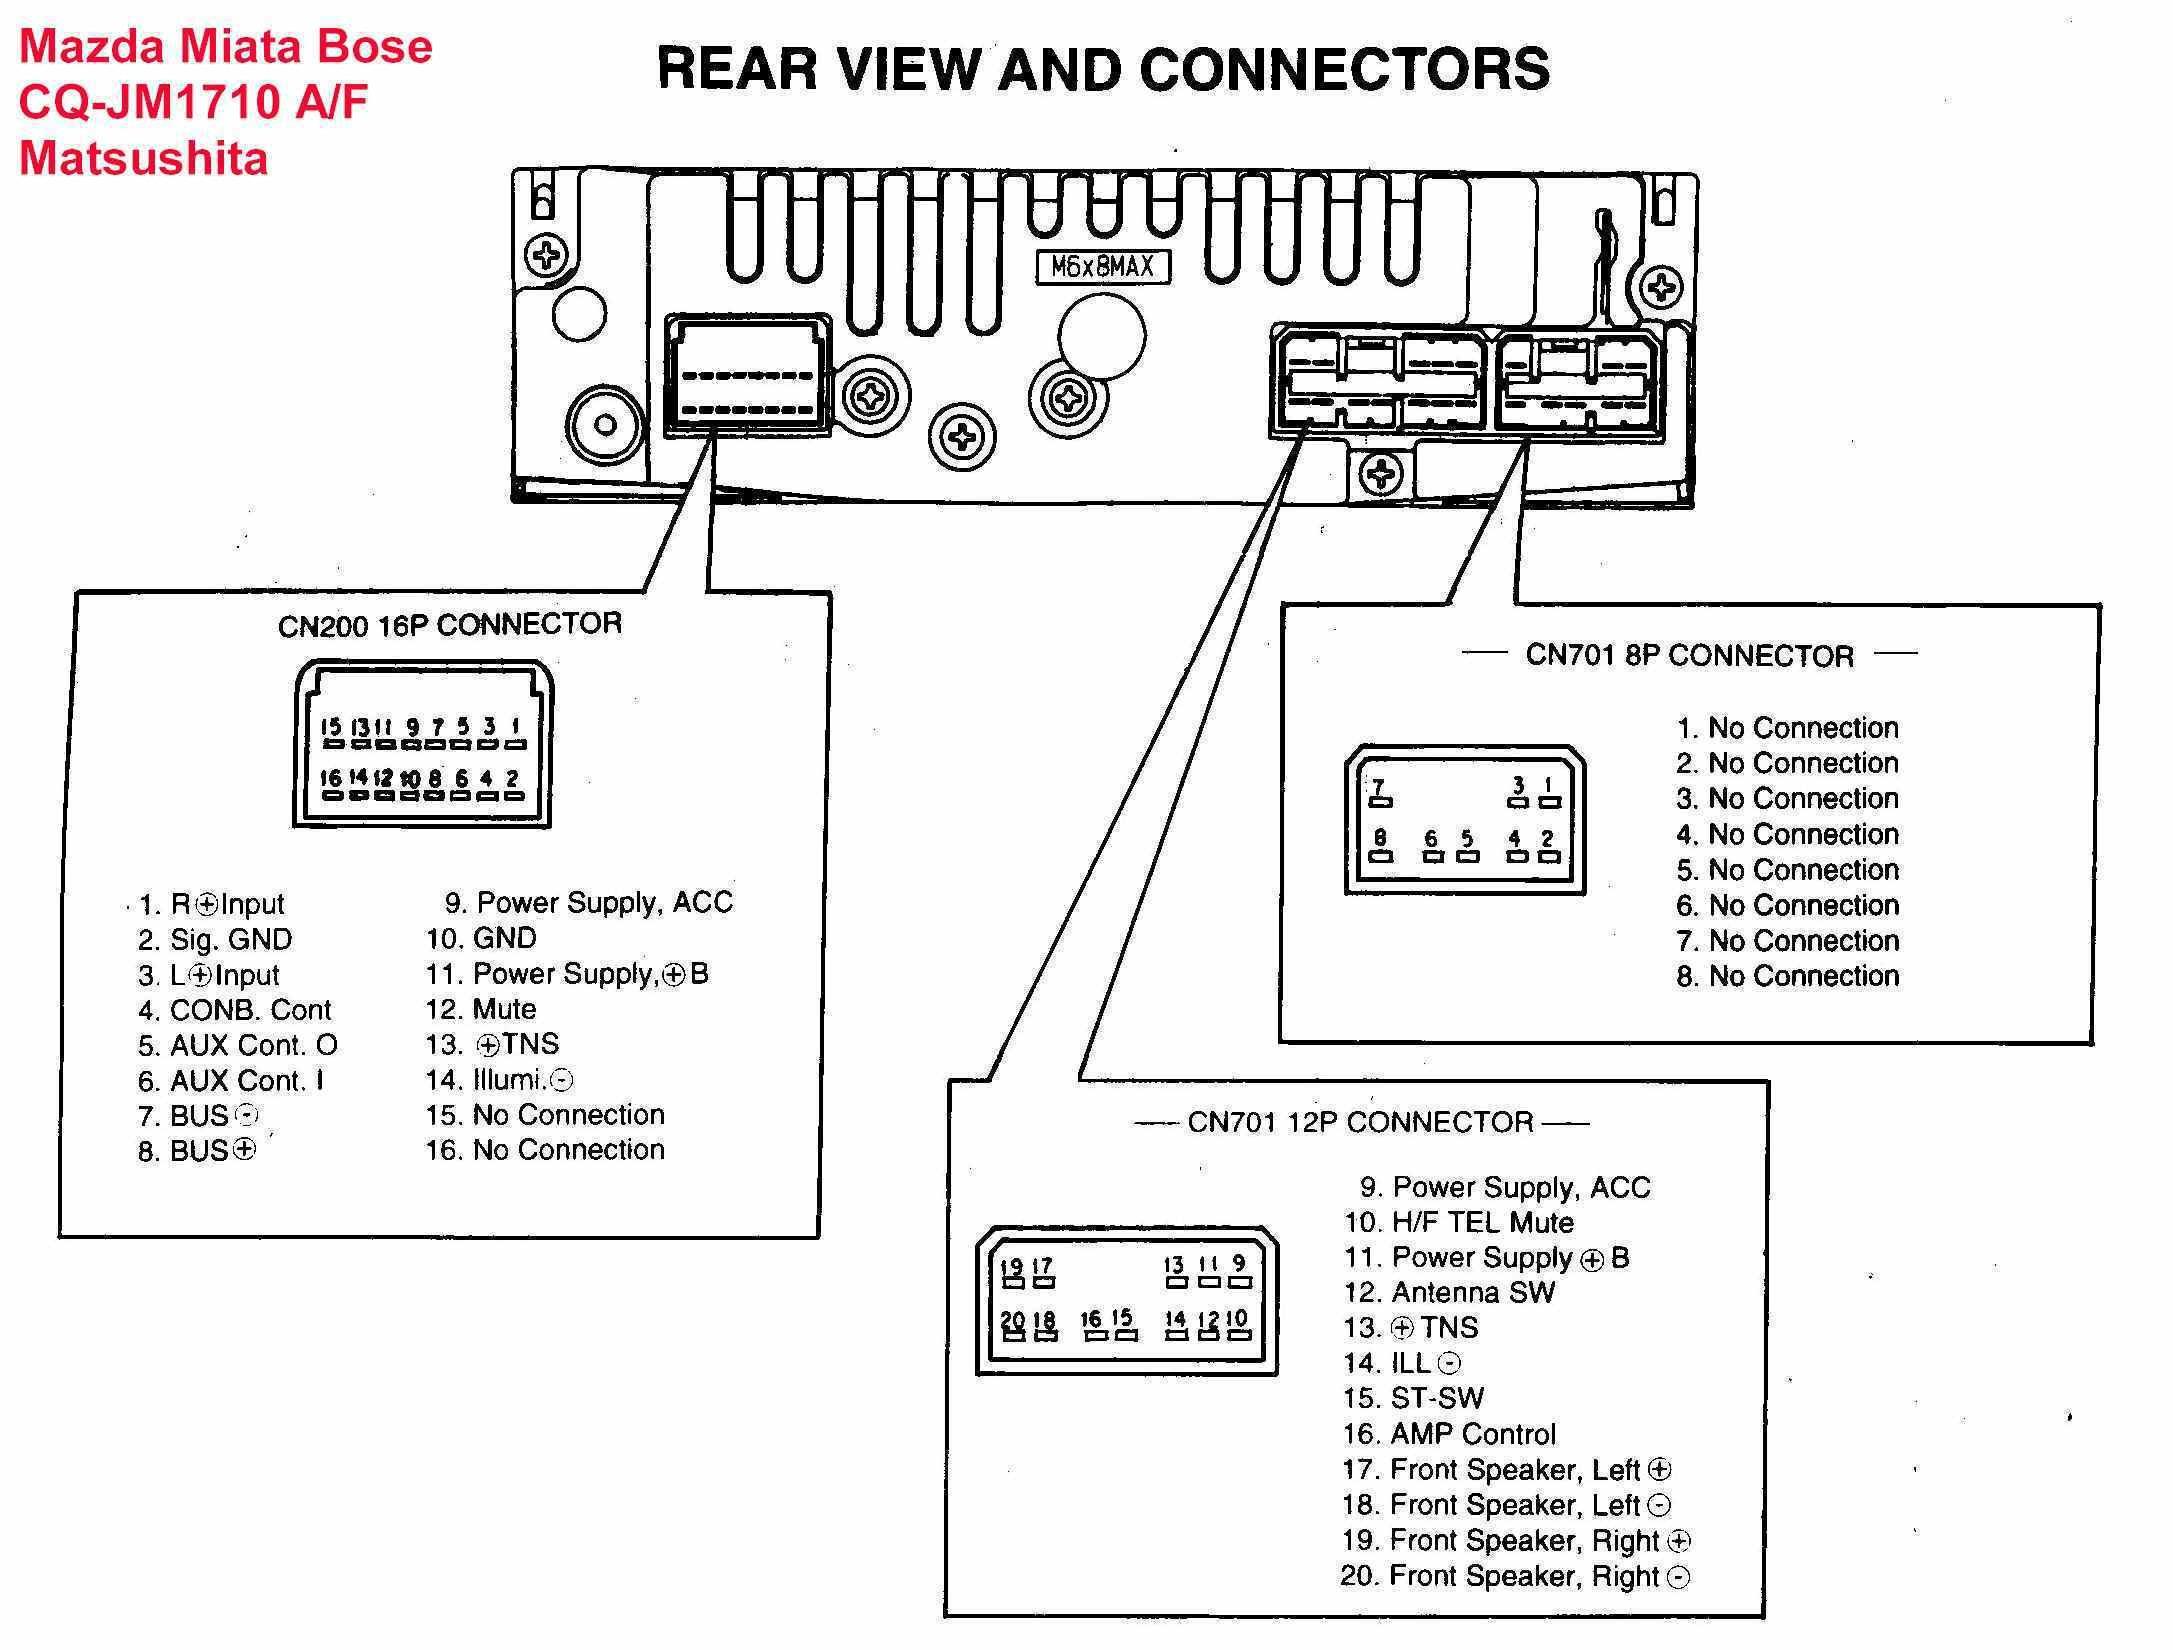 AX_1591] Pioneer Deh P41 Car Audio Wiring Download Diagram